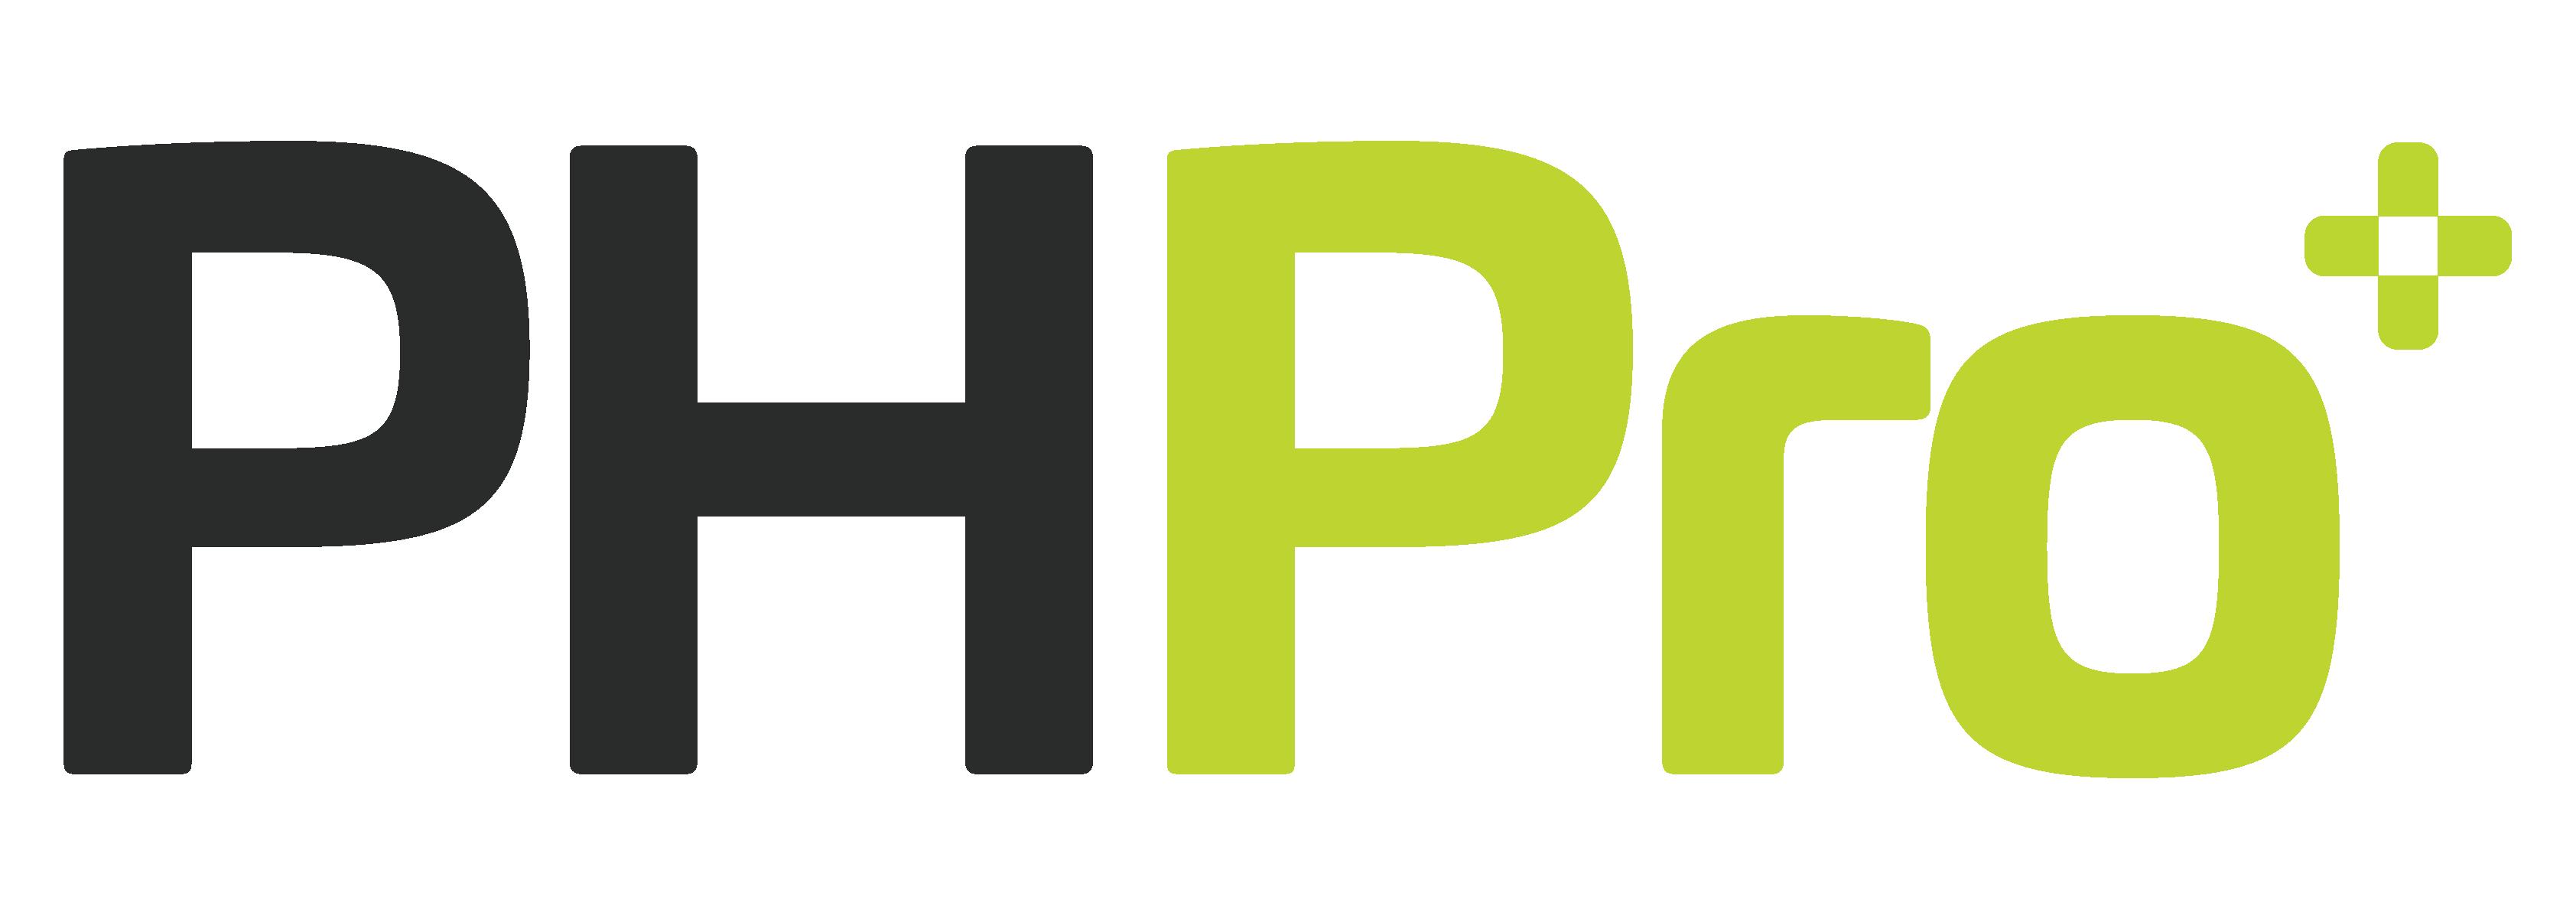 phpro_logo_original